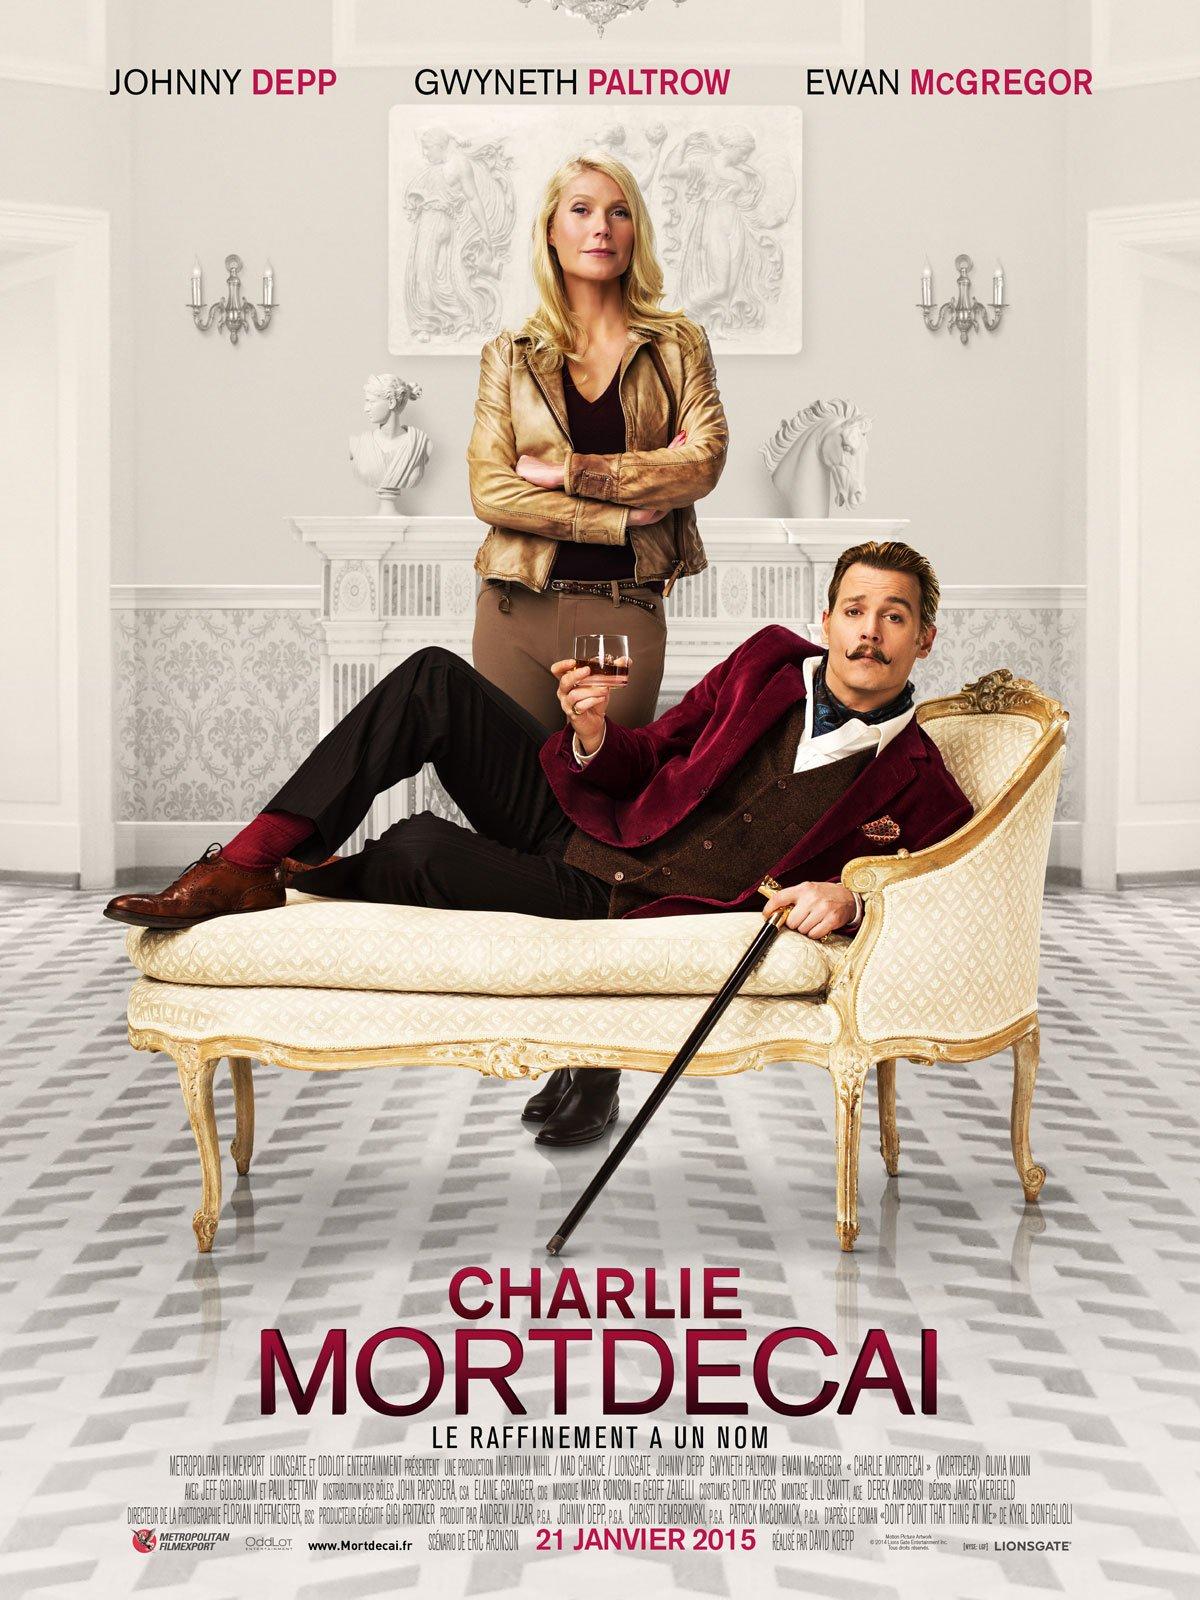 Charlie Mortdecai affiche du film